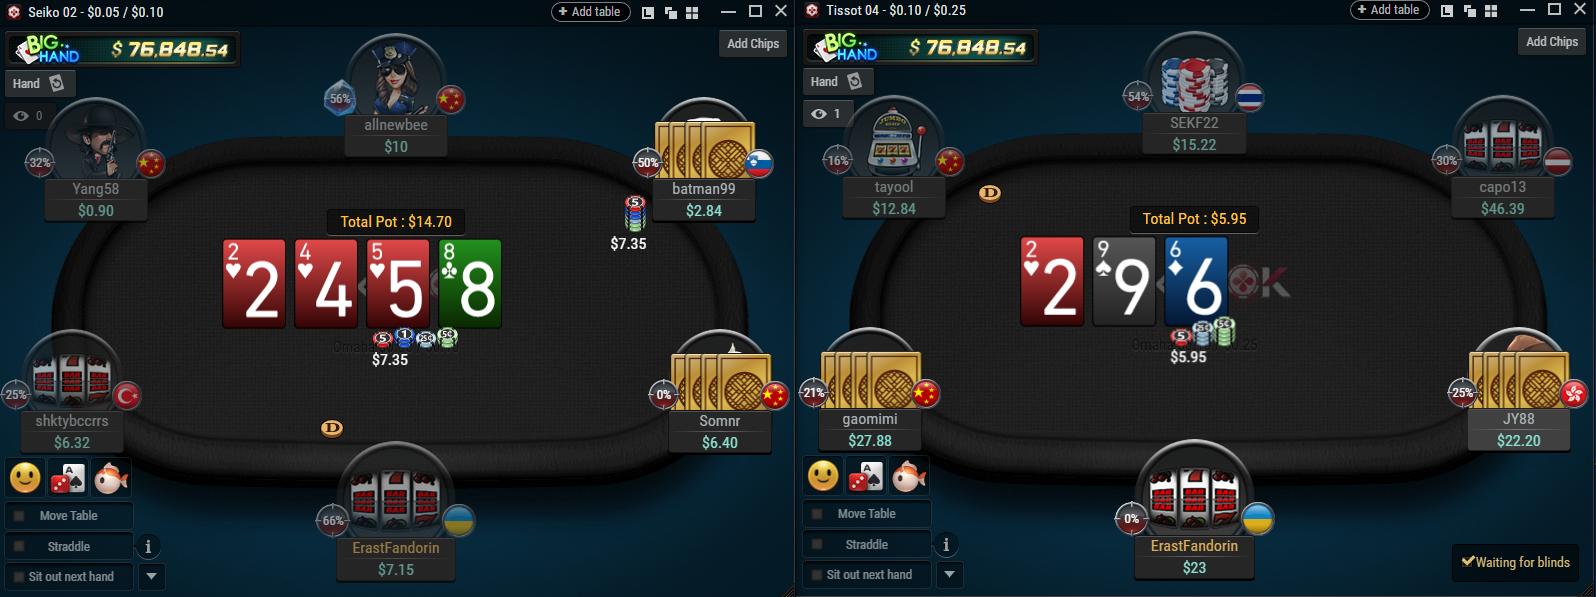 Pokerok table